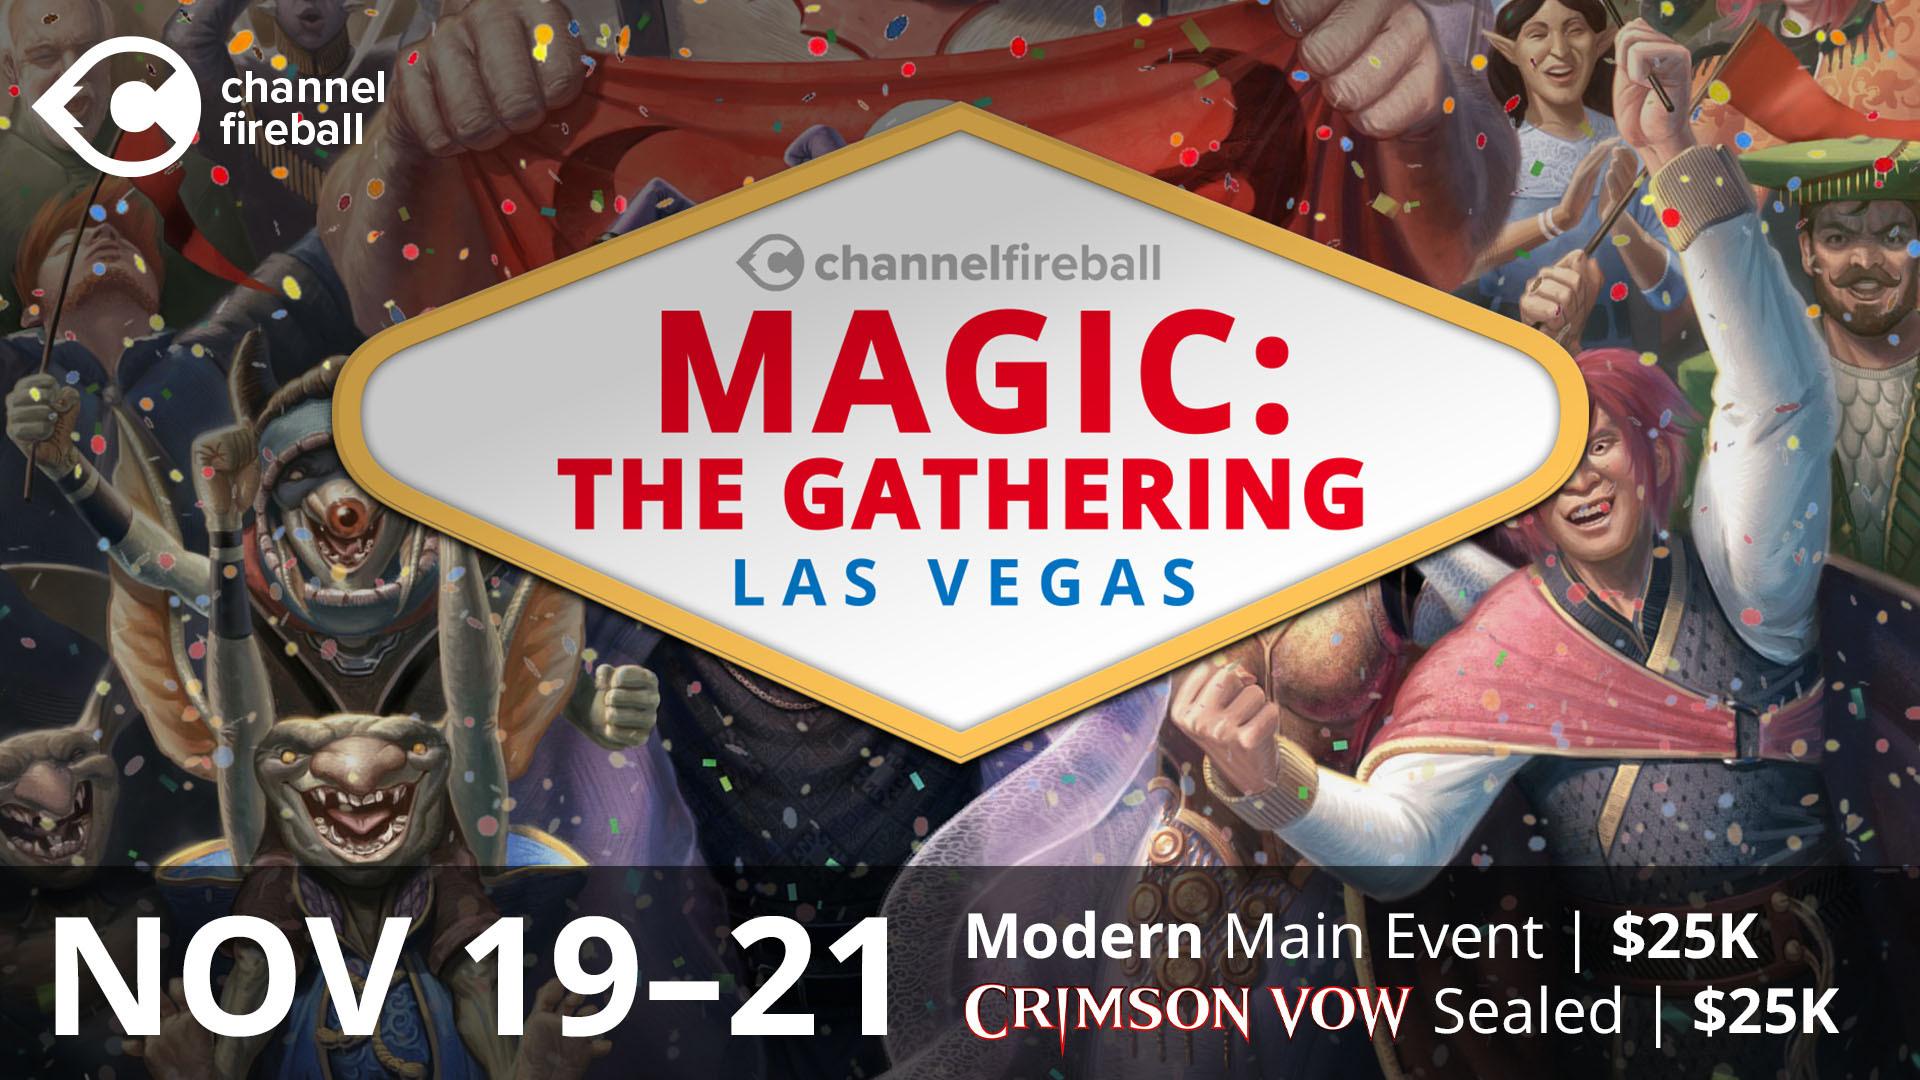 ChannelFireball Announces Magic: the Gathering Las Vegas Nov 19-21